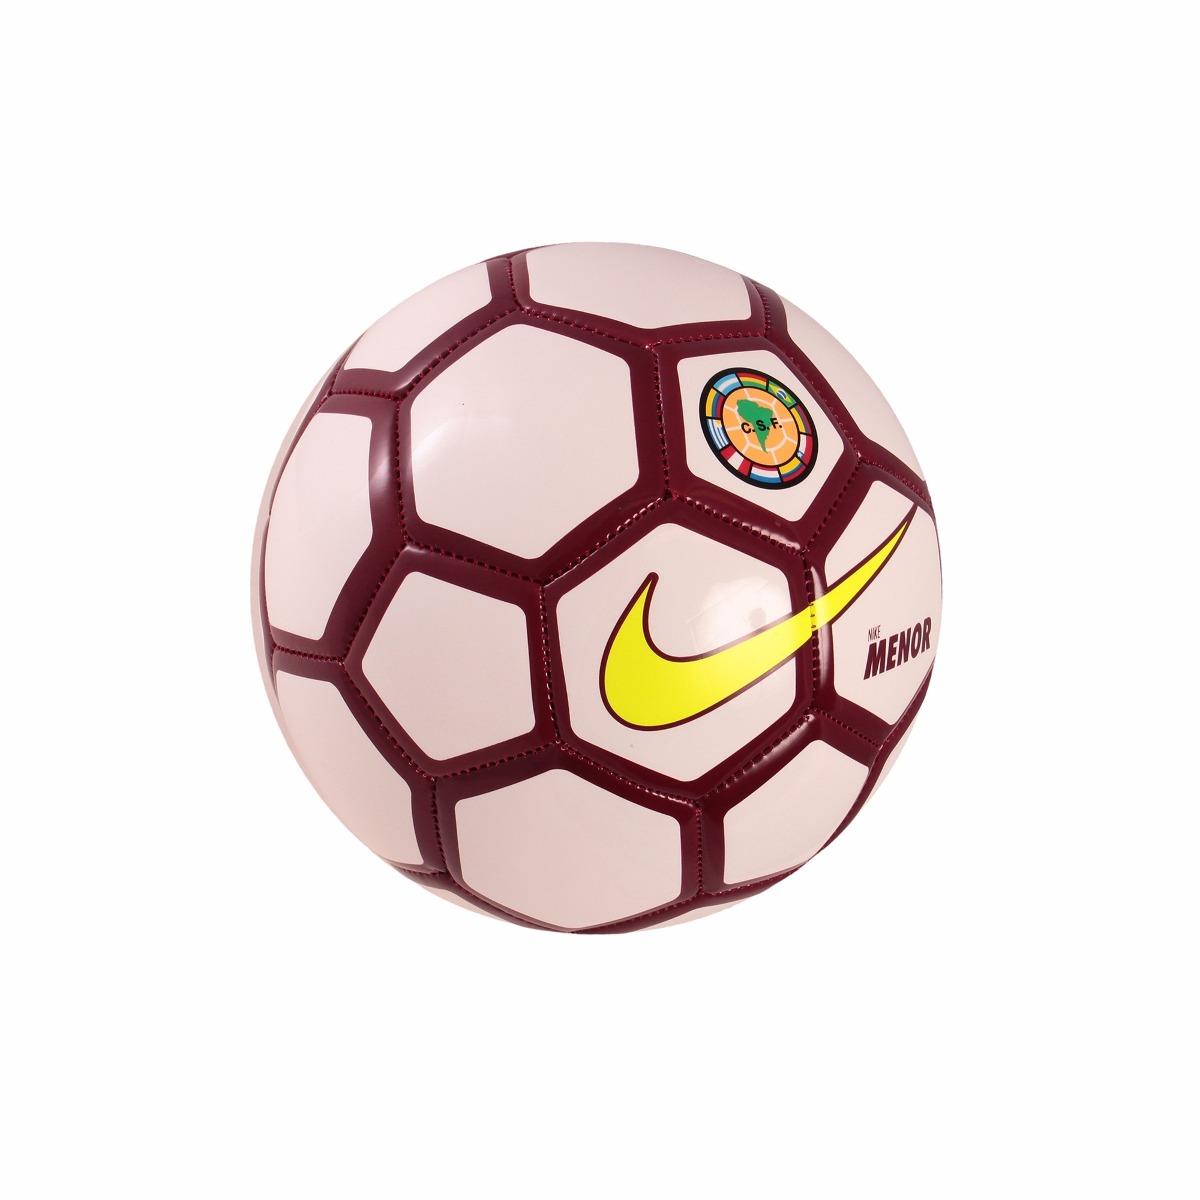 Bola Nike Menor Csf Futsal - Original - R  128 68d44a92a8b2b